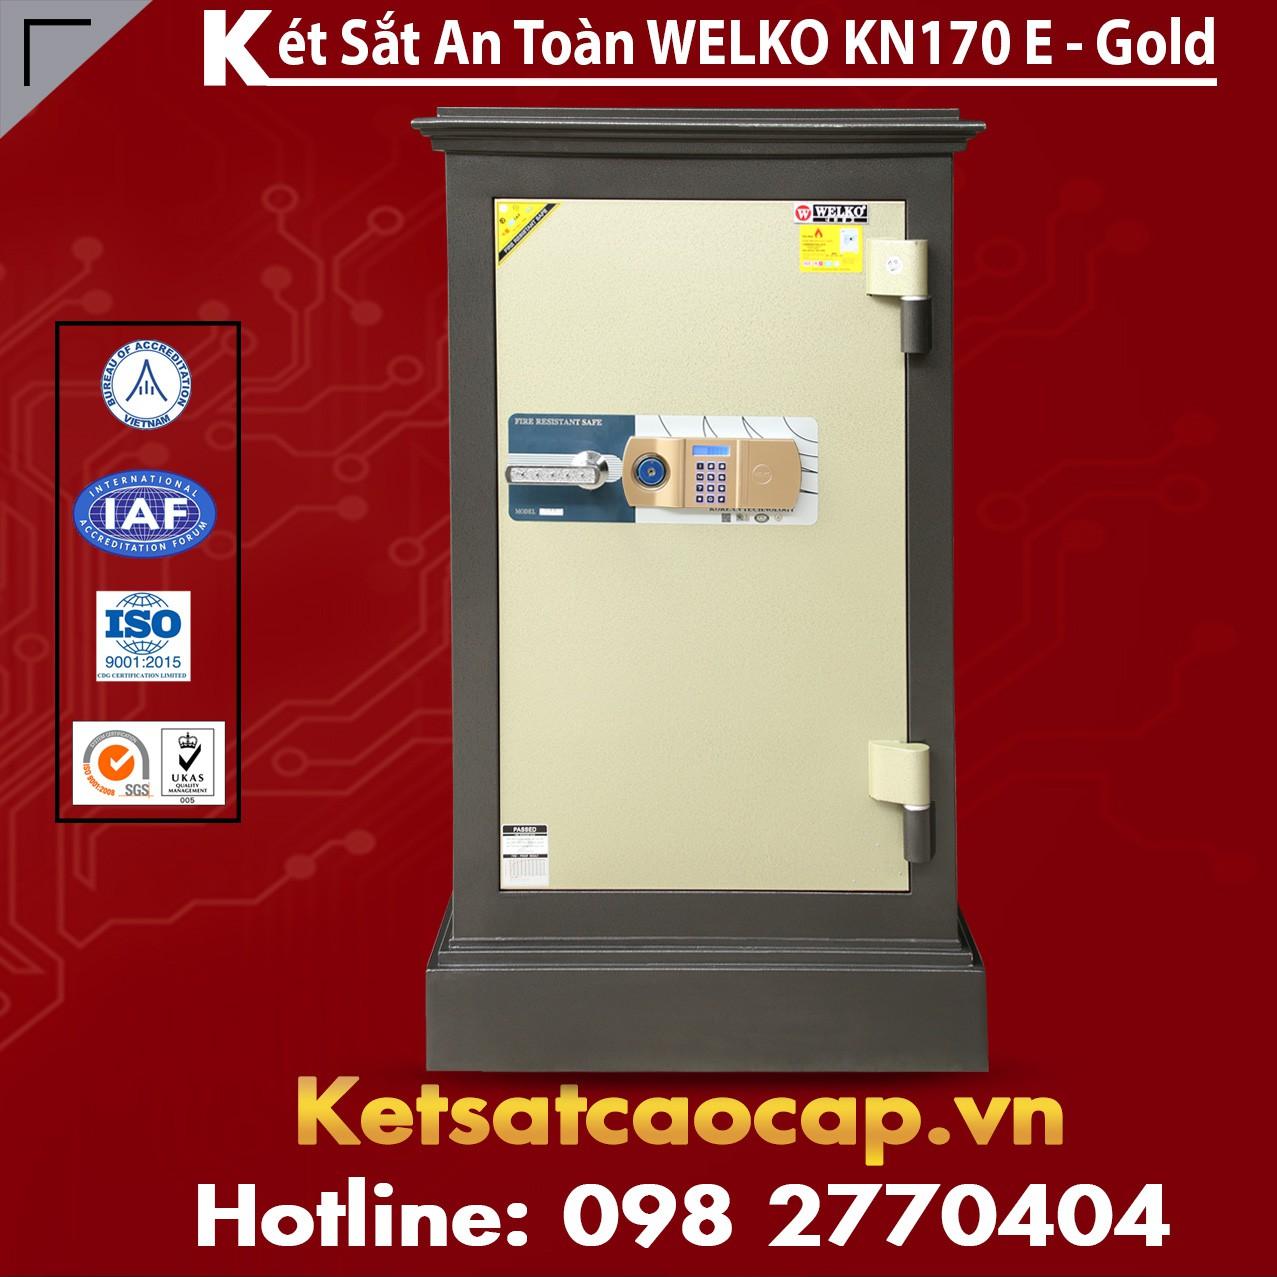 Két Sắt Đặt Theo Yêu Cầu WELKO KN170 Black E Gold